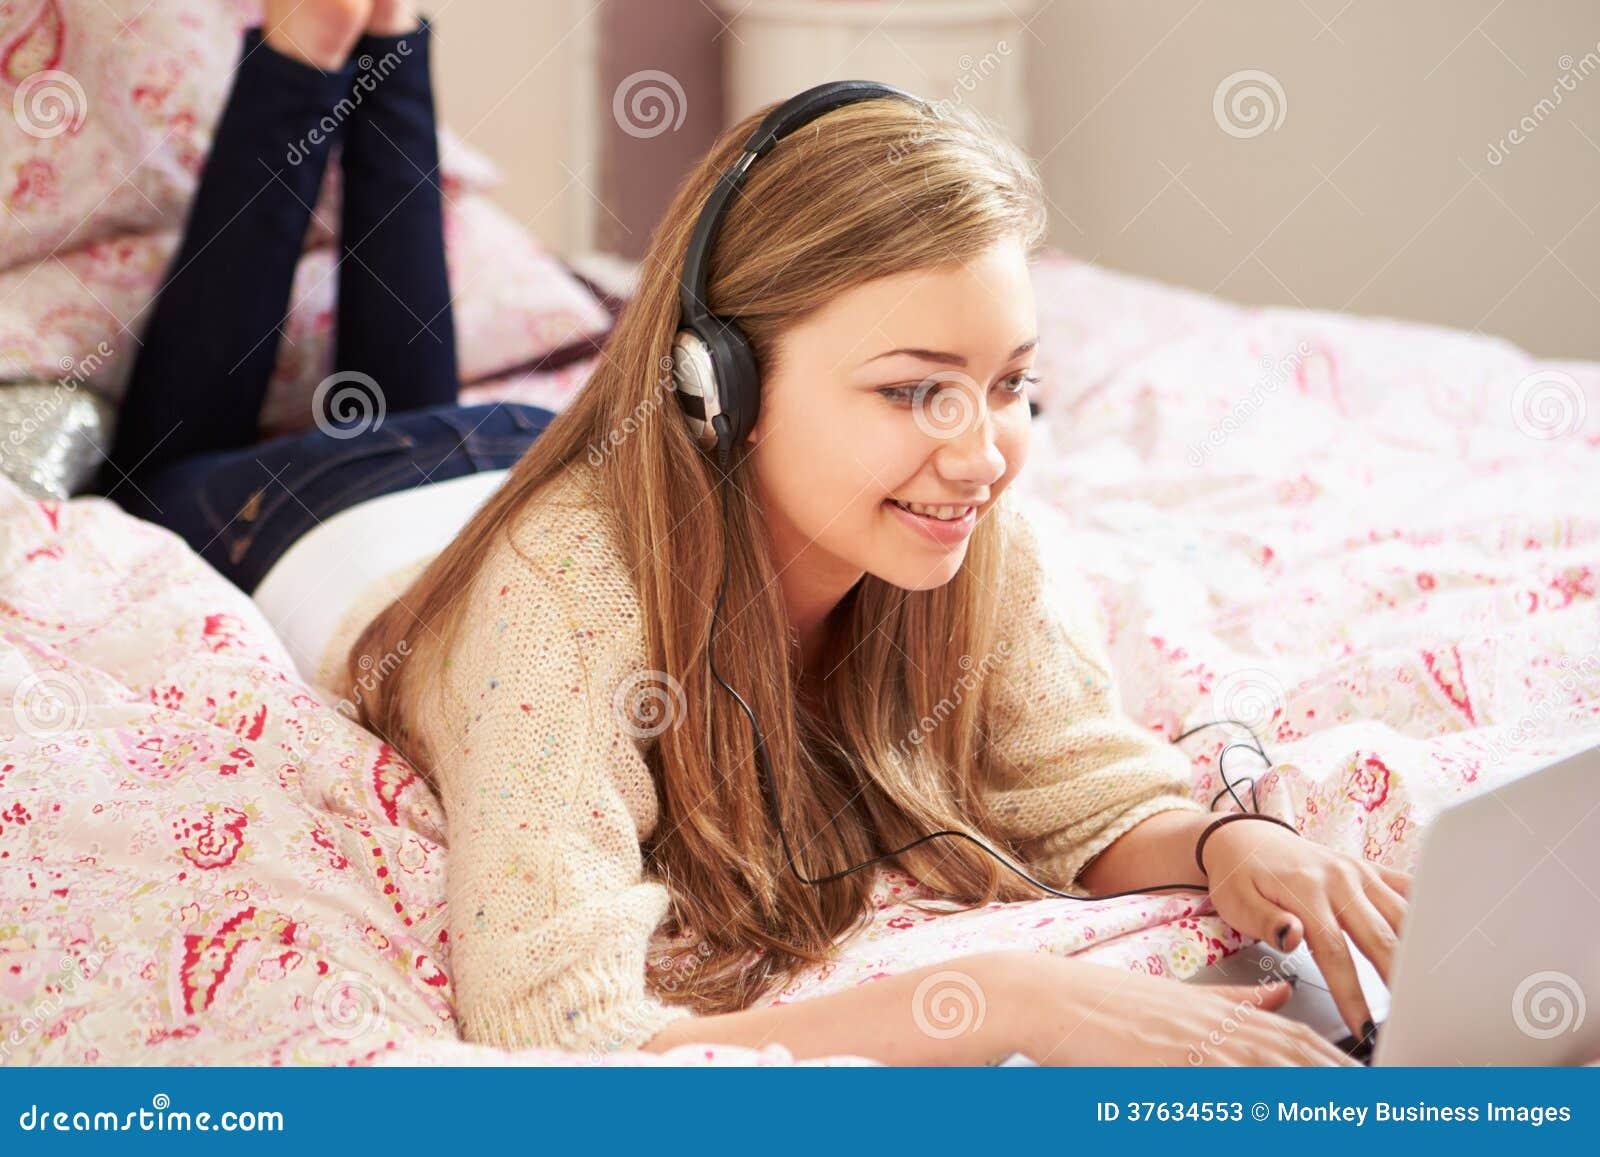 Teenage Girl Lying On Bed Using Laptop Wearing Headphones